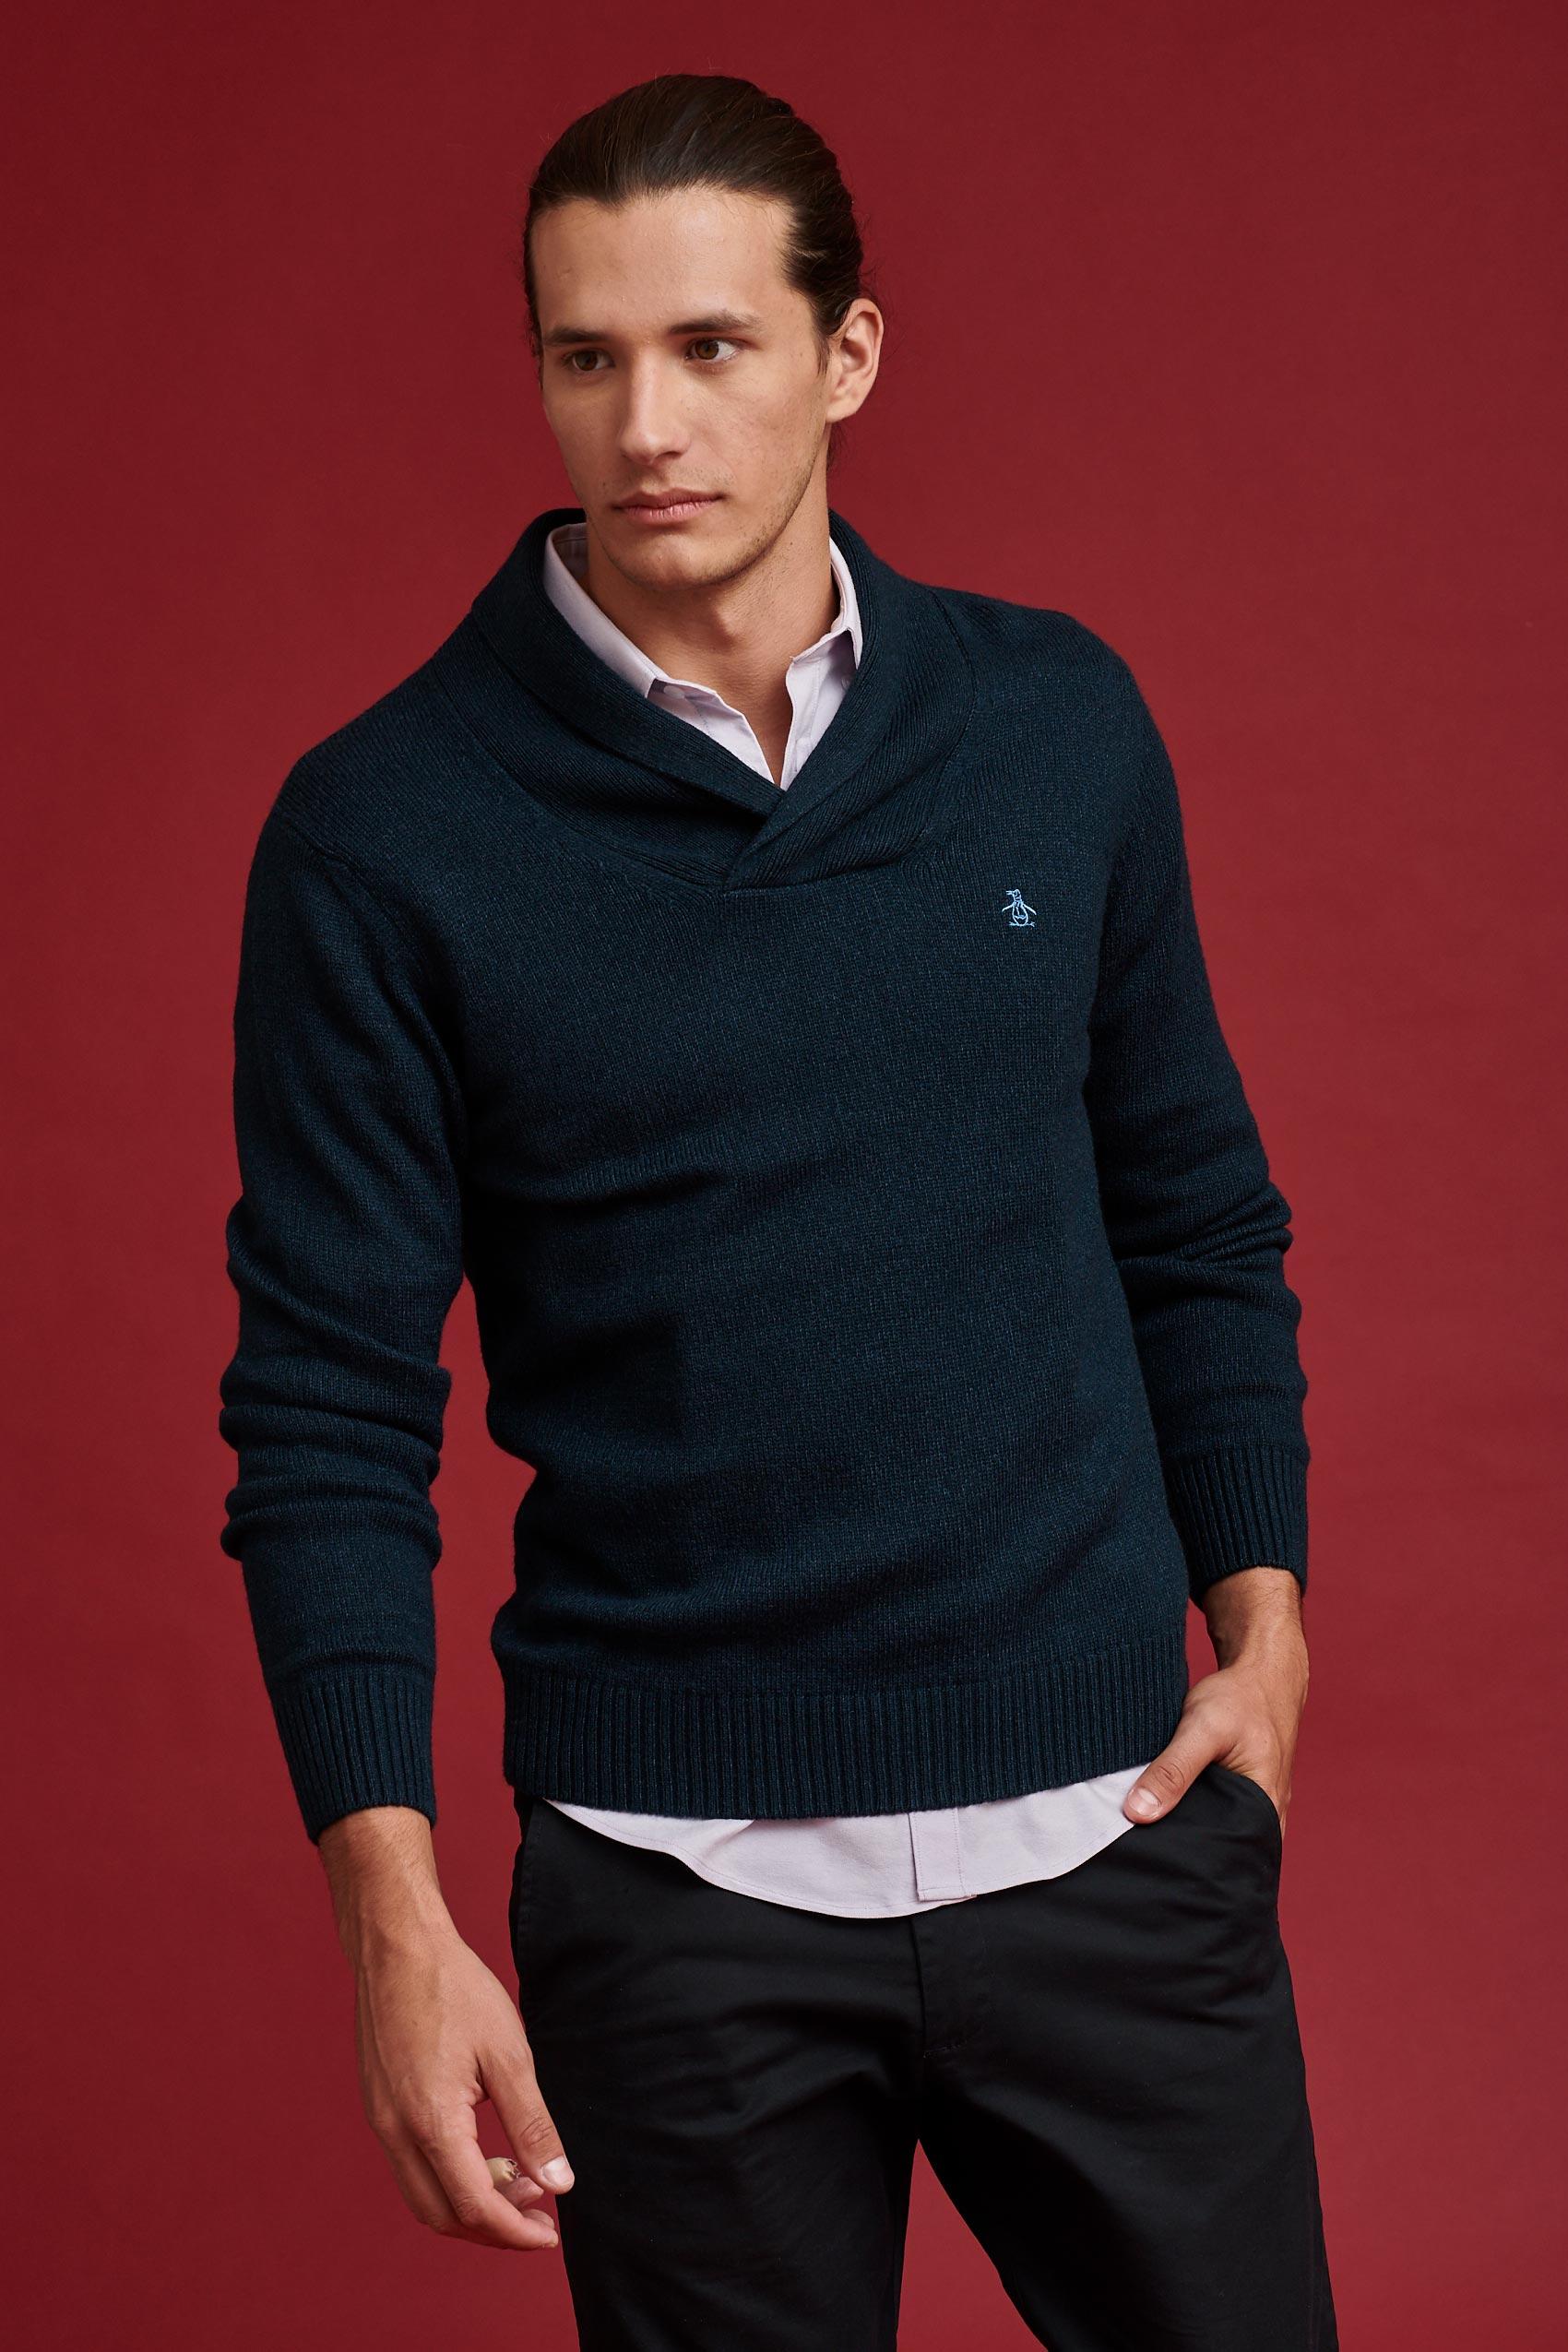 penguin_shawl-collar-sweater_00-14-2020__picture-14751